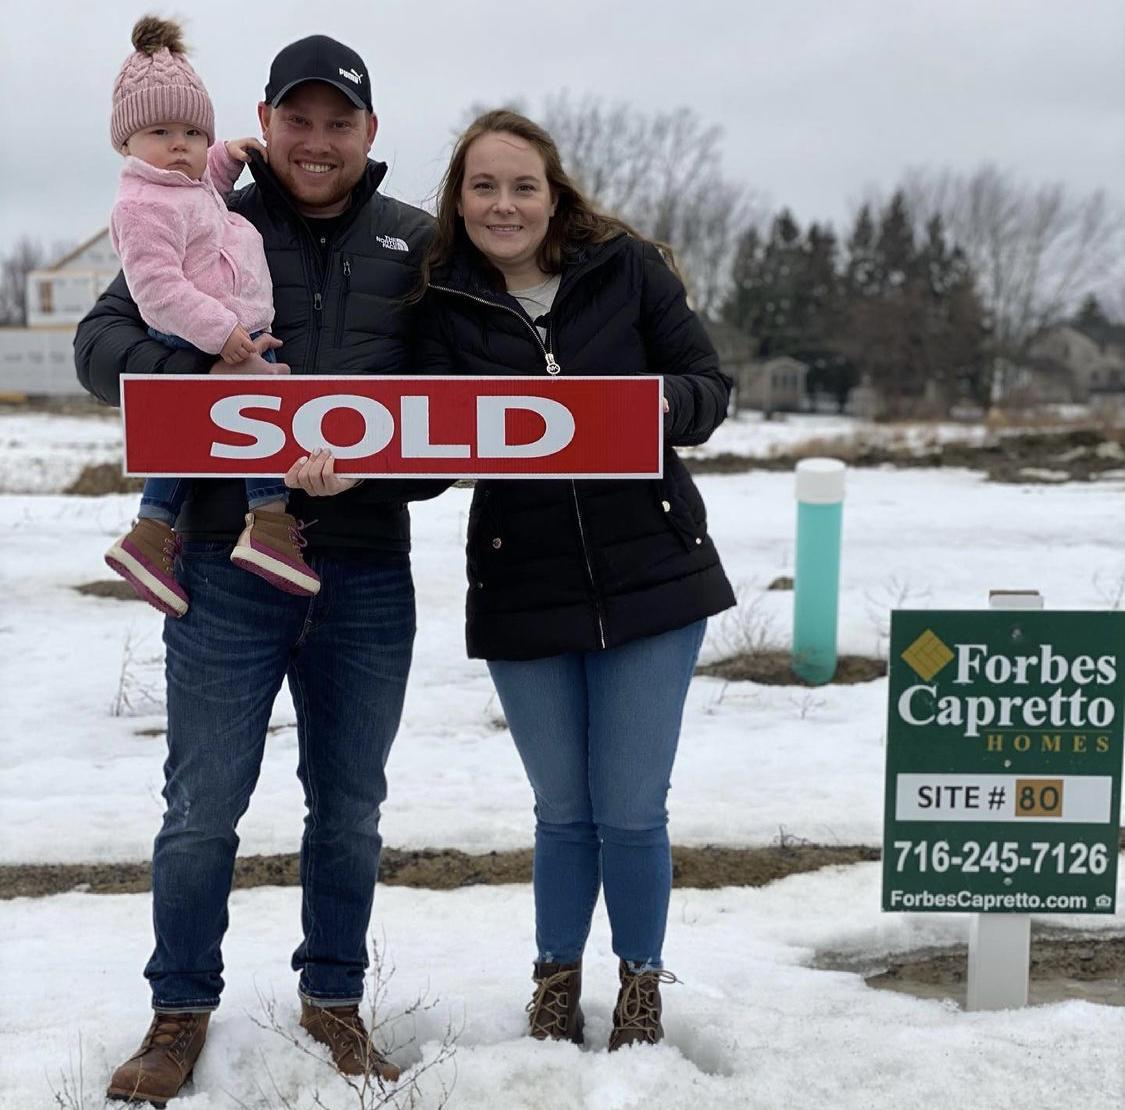 Forbes Capretto Homes - Testimonial - Josh and Monica Maida